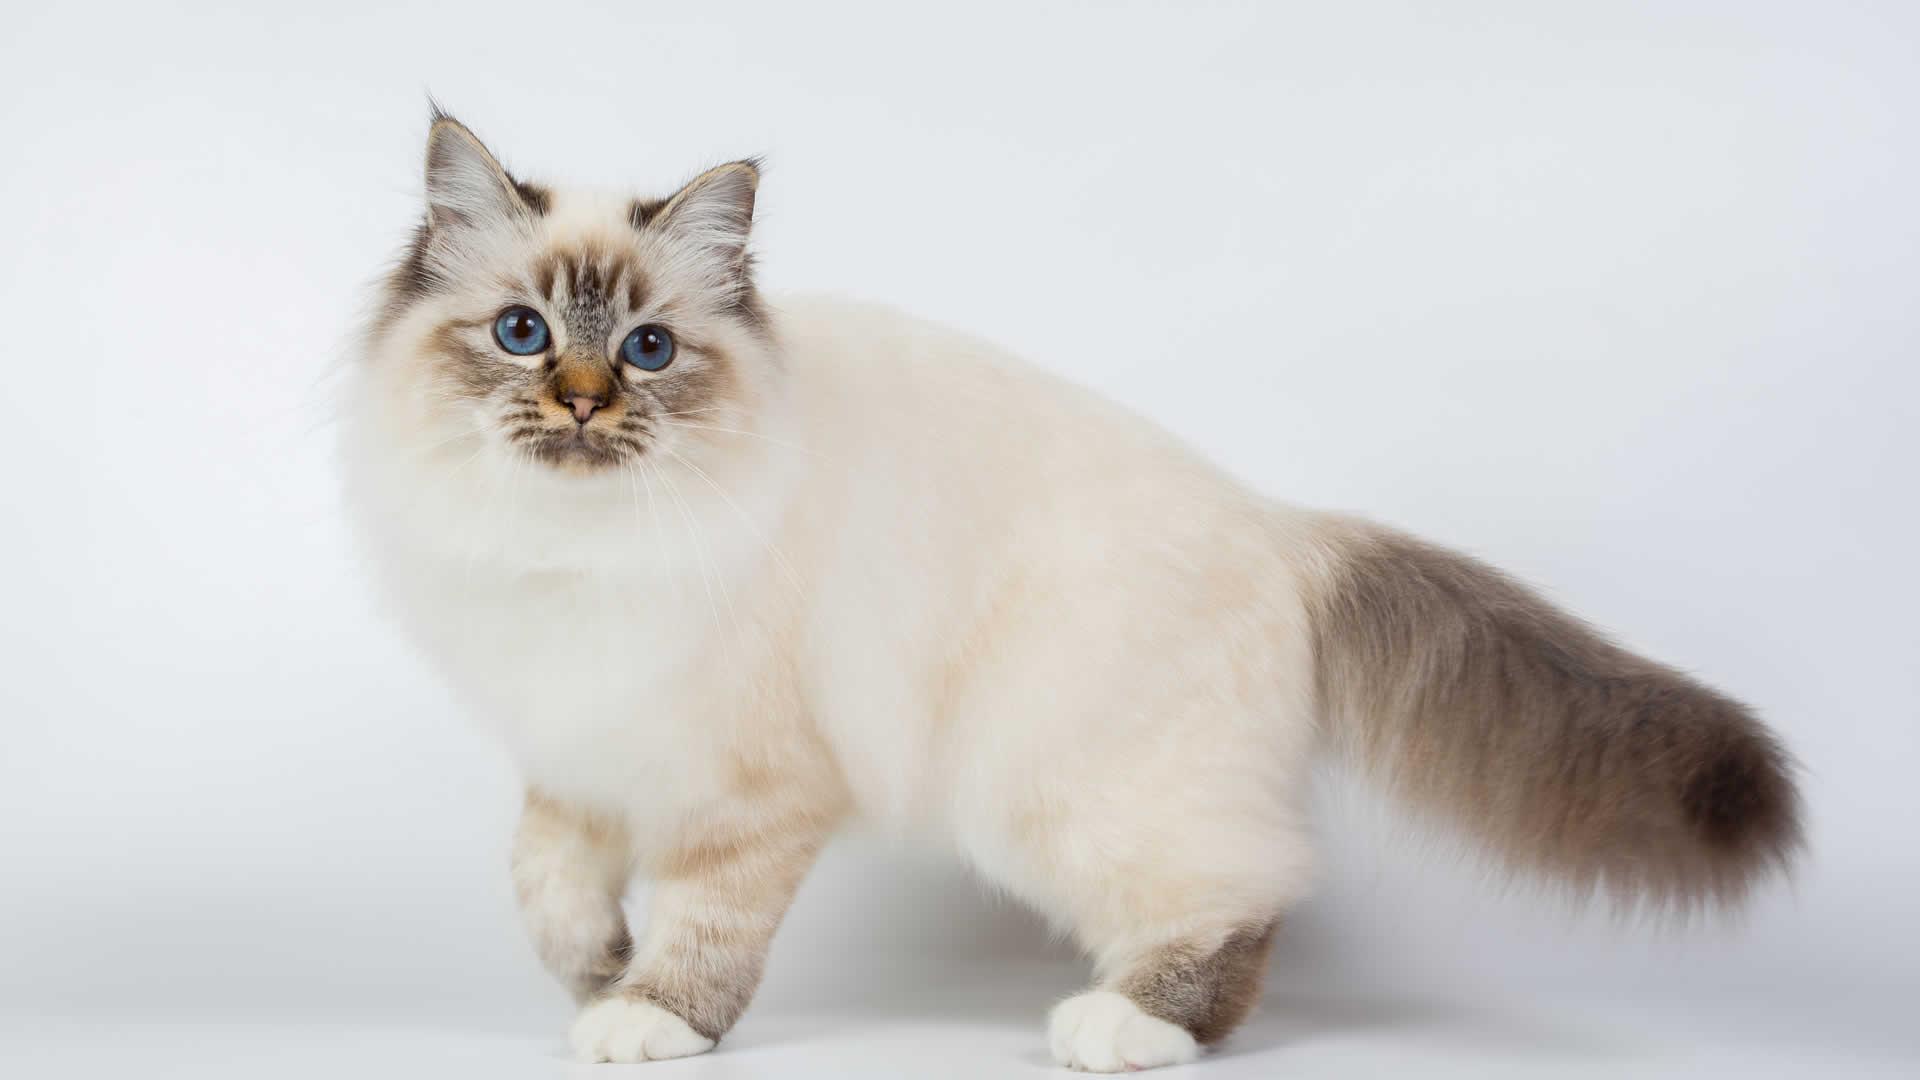 Fluffy long tailed Birman cat